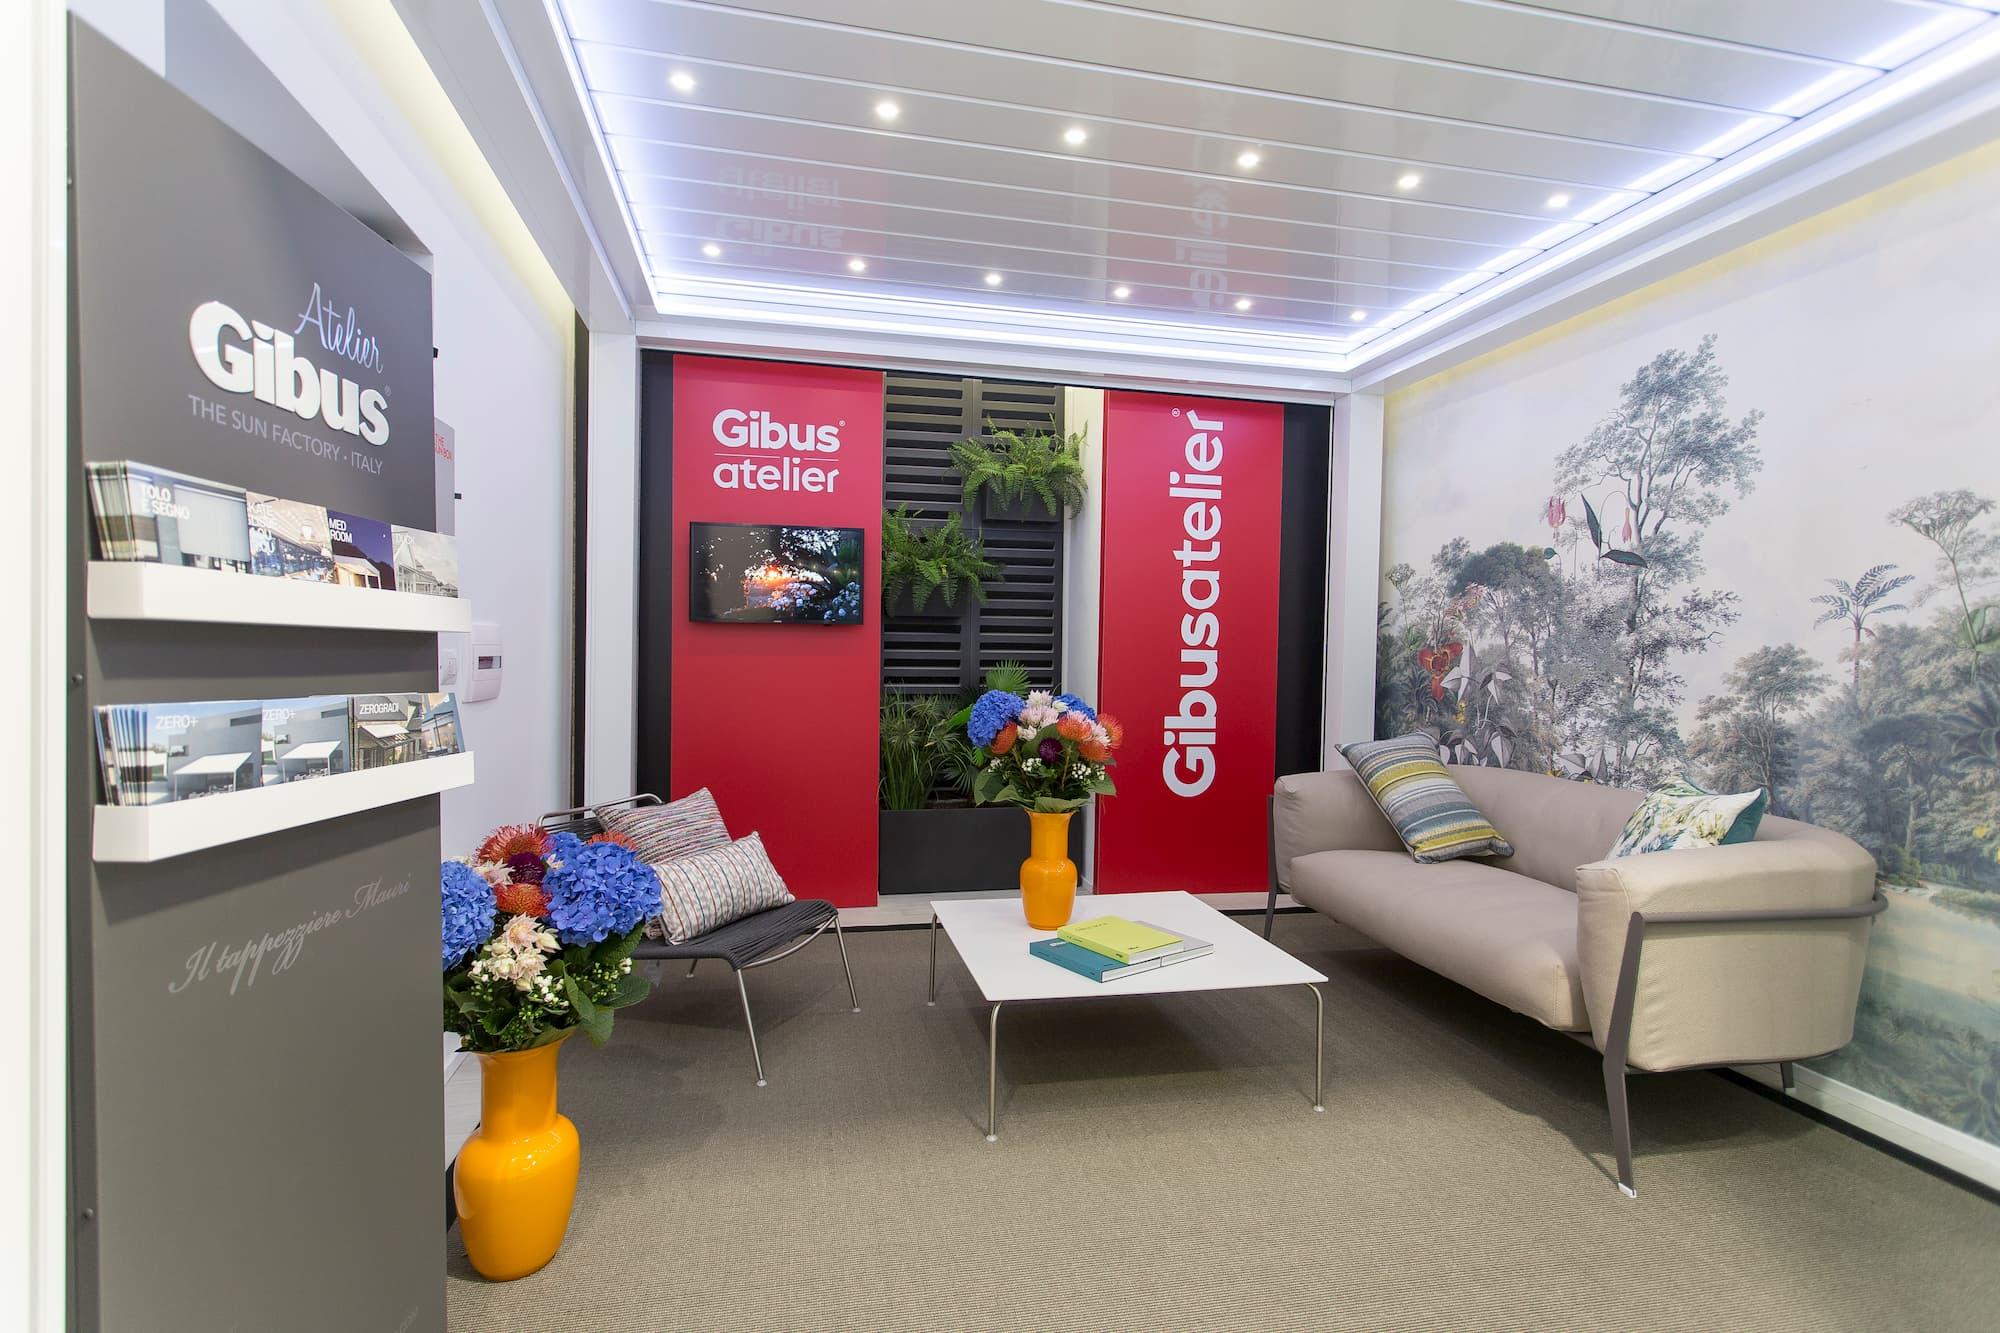 foto di interni design milano gibus atelier luxury